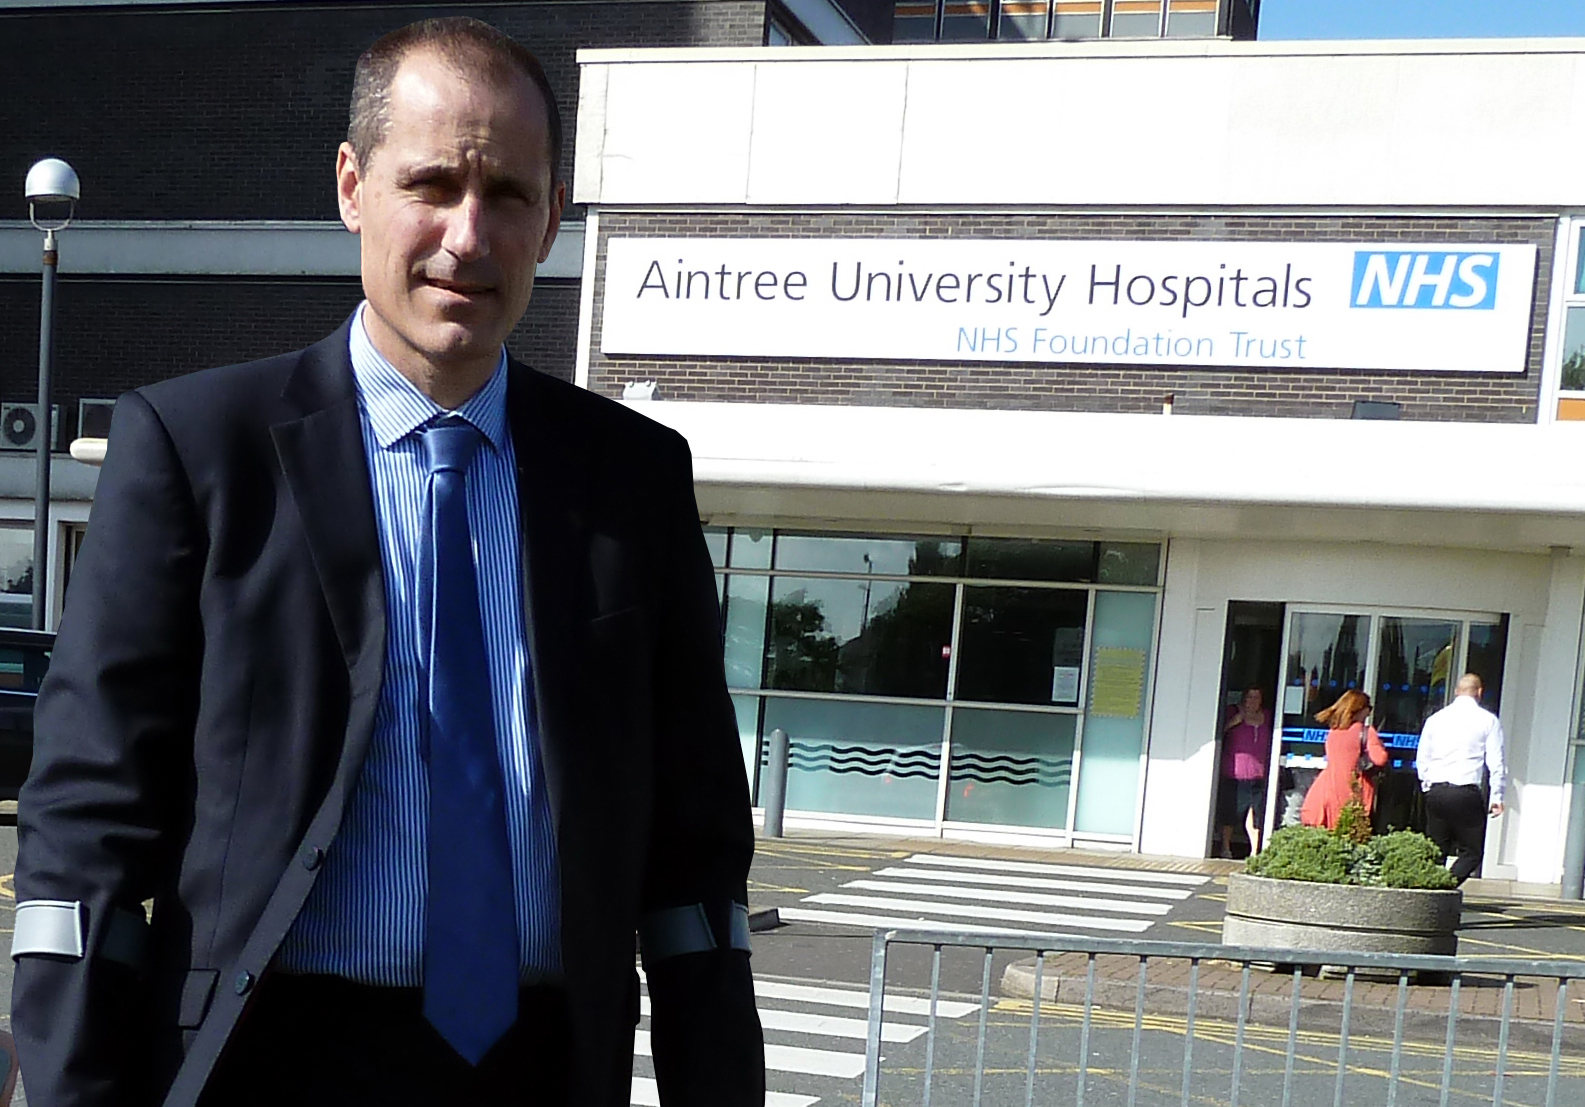 Bill Estersn at Aintree Hospital A&E